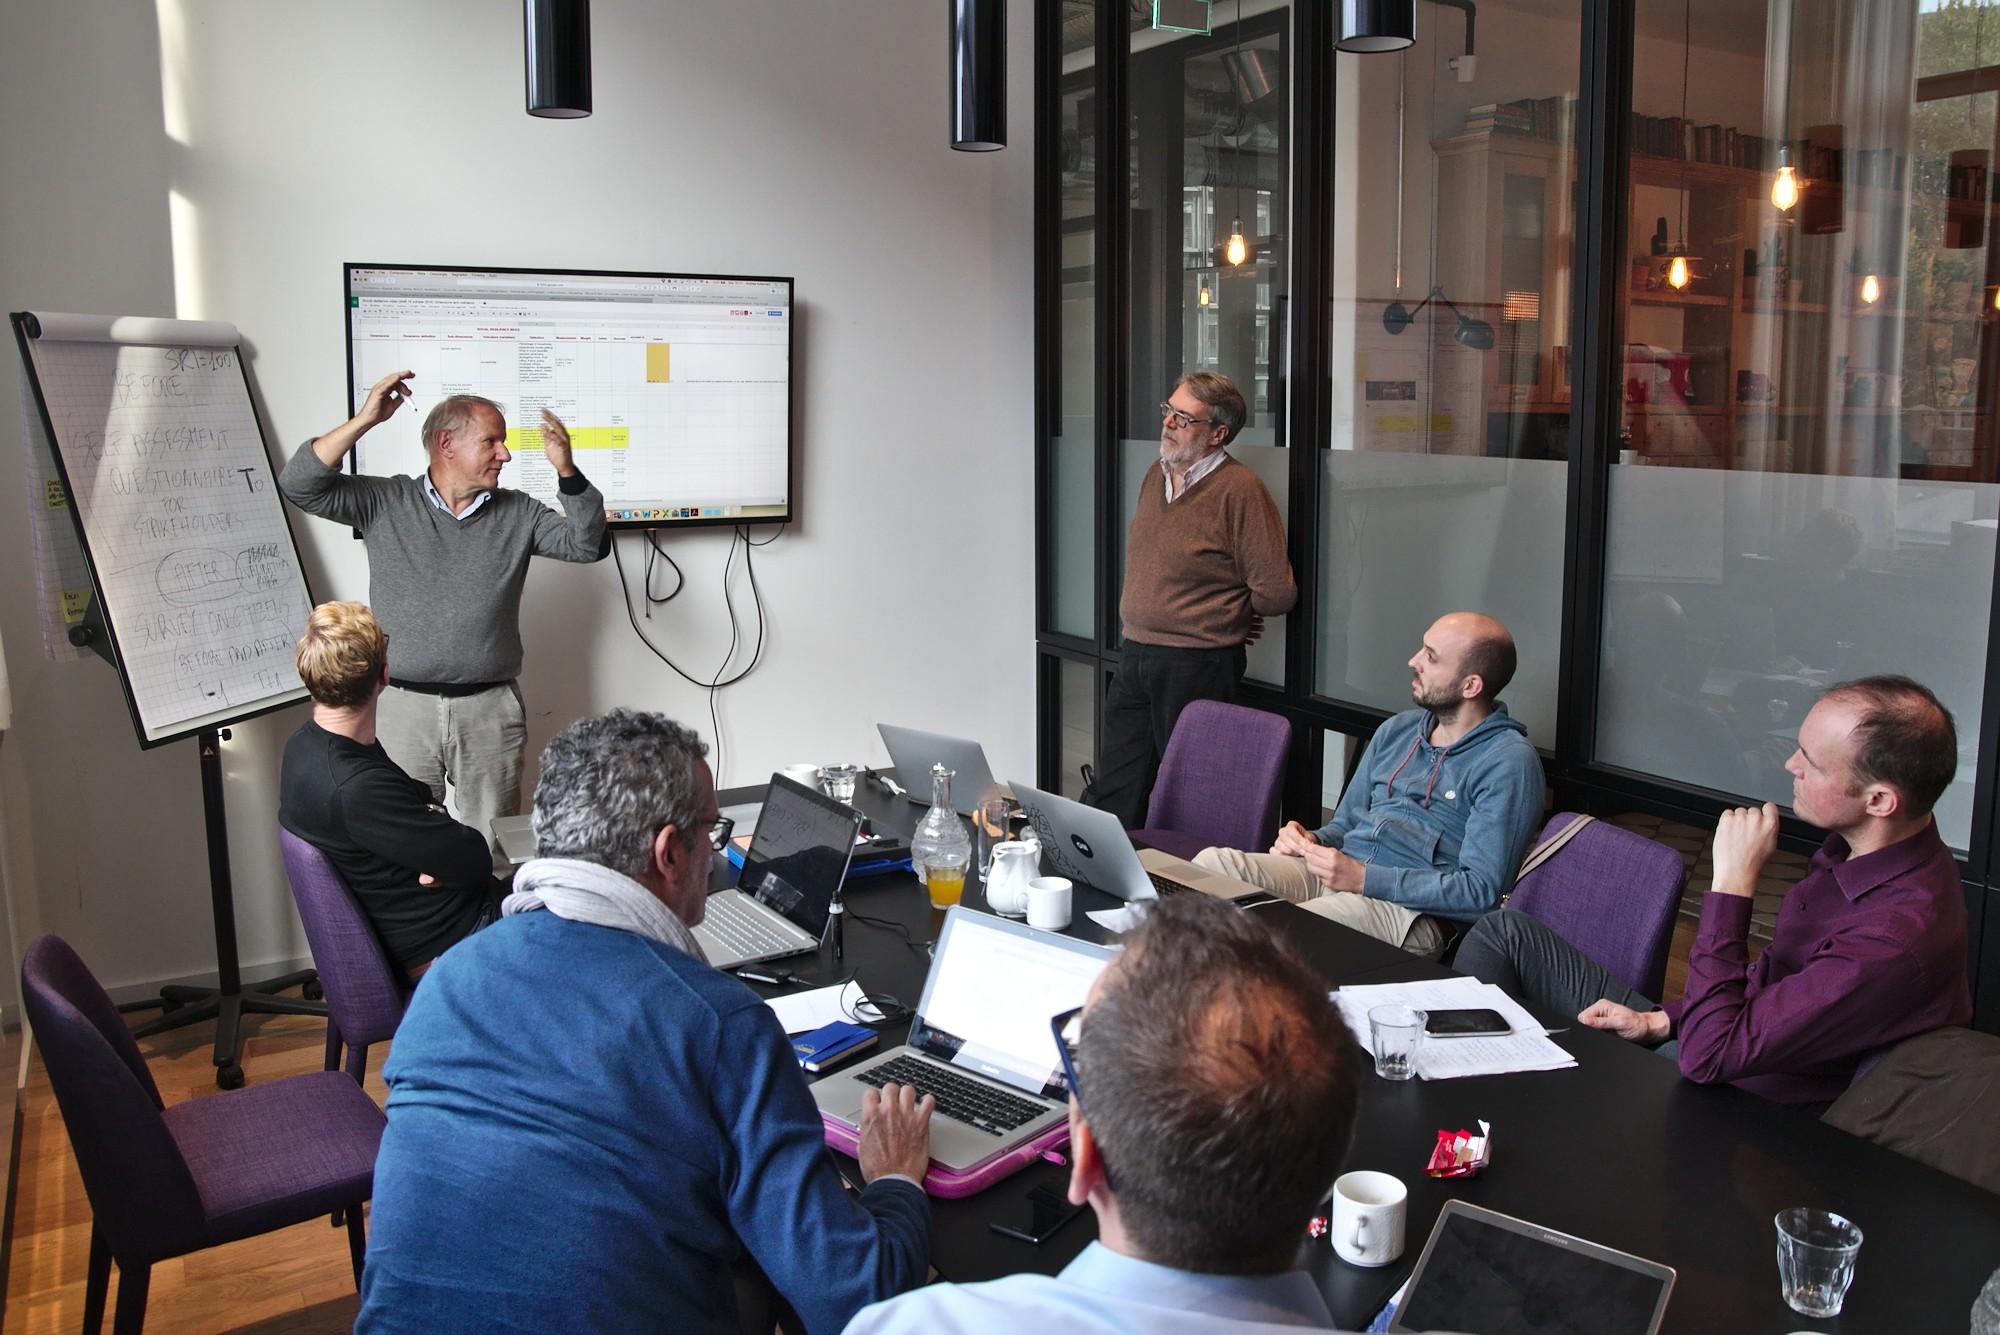 Progress on index and visualisation tool in Hamburg